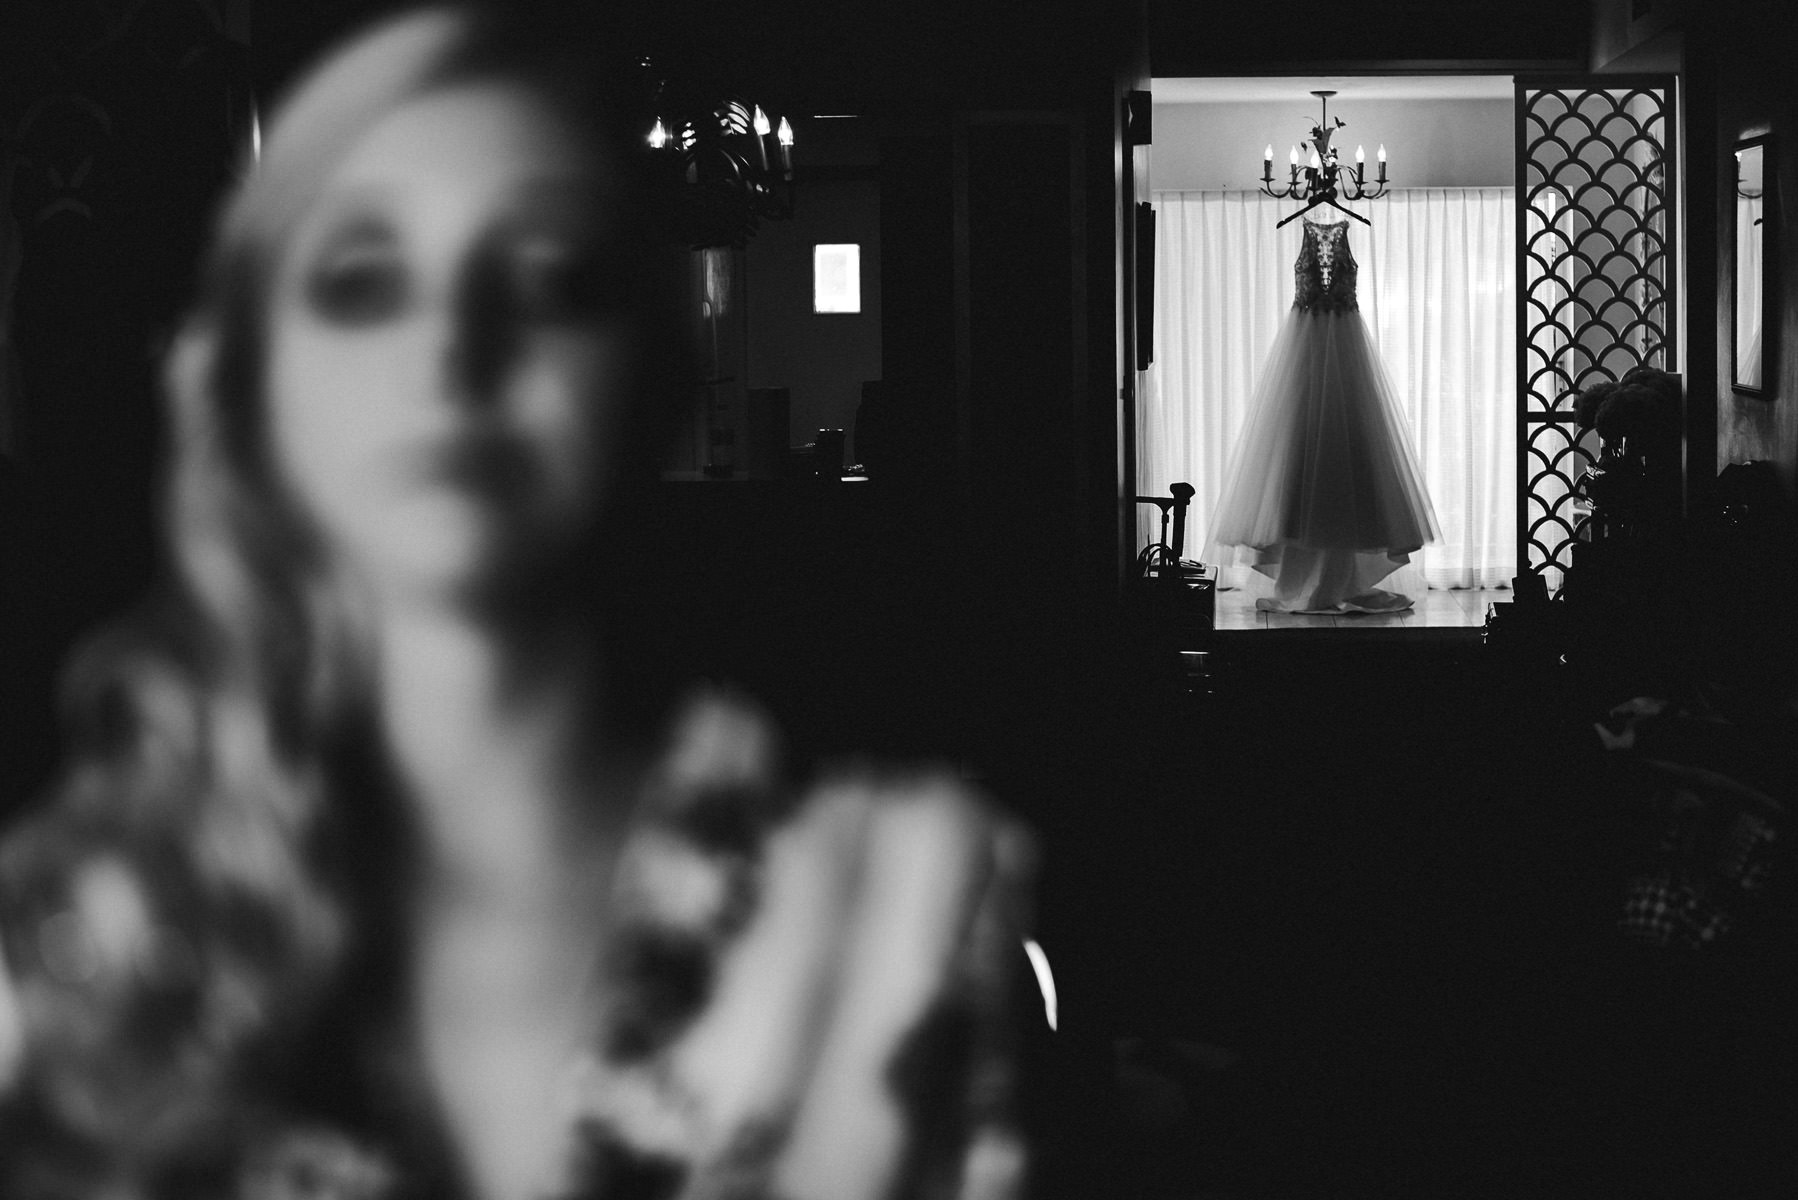 wedding-dress-bride-getting-ready-black-and-white-destination-photographer-tiny-house-photo.jpg